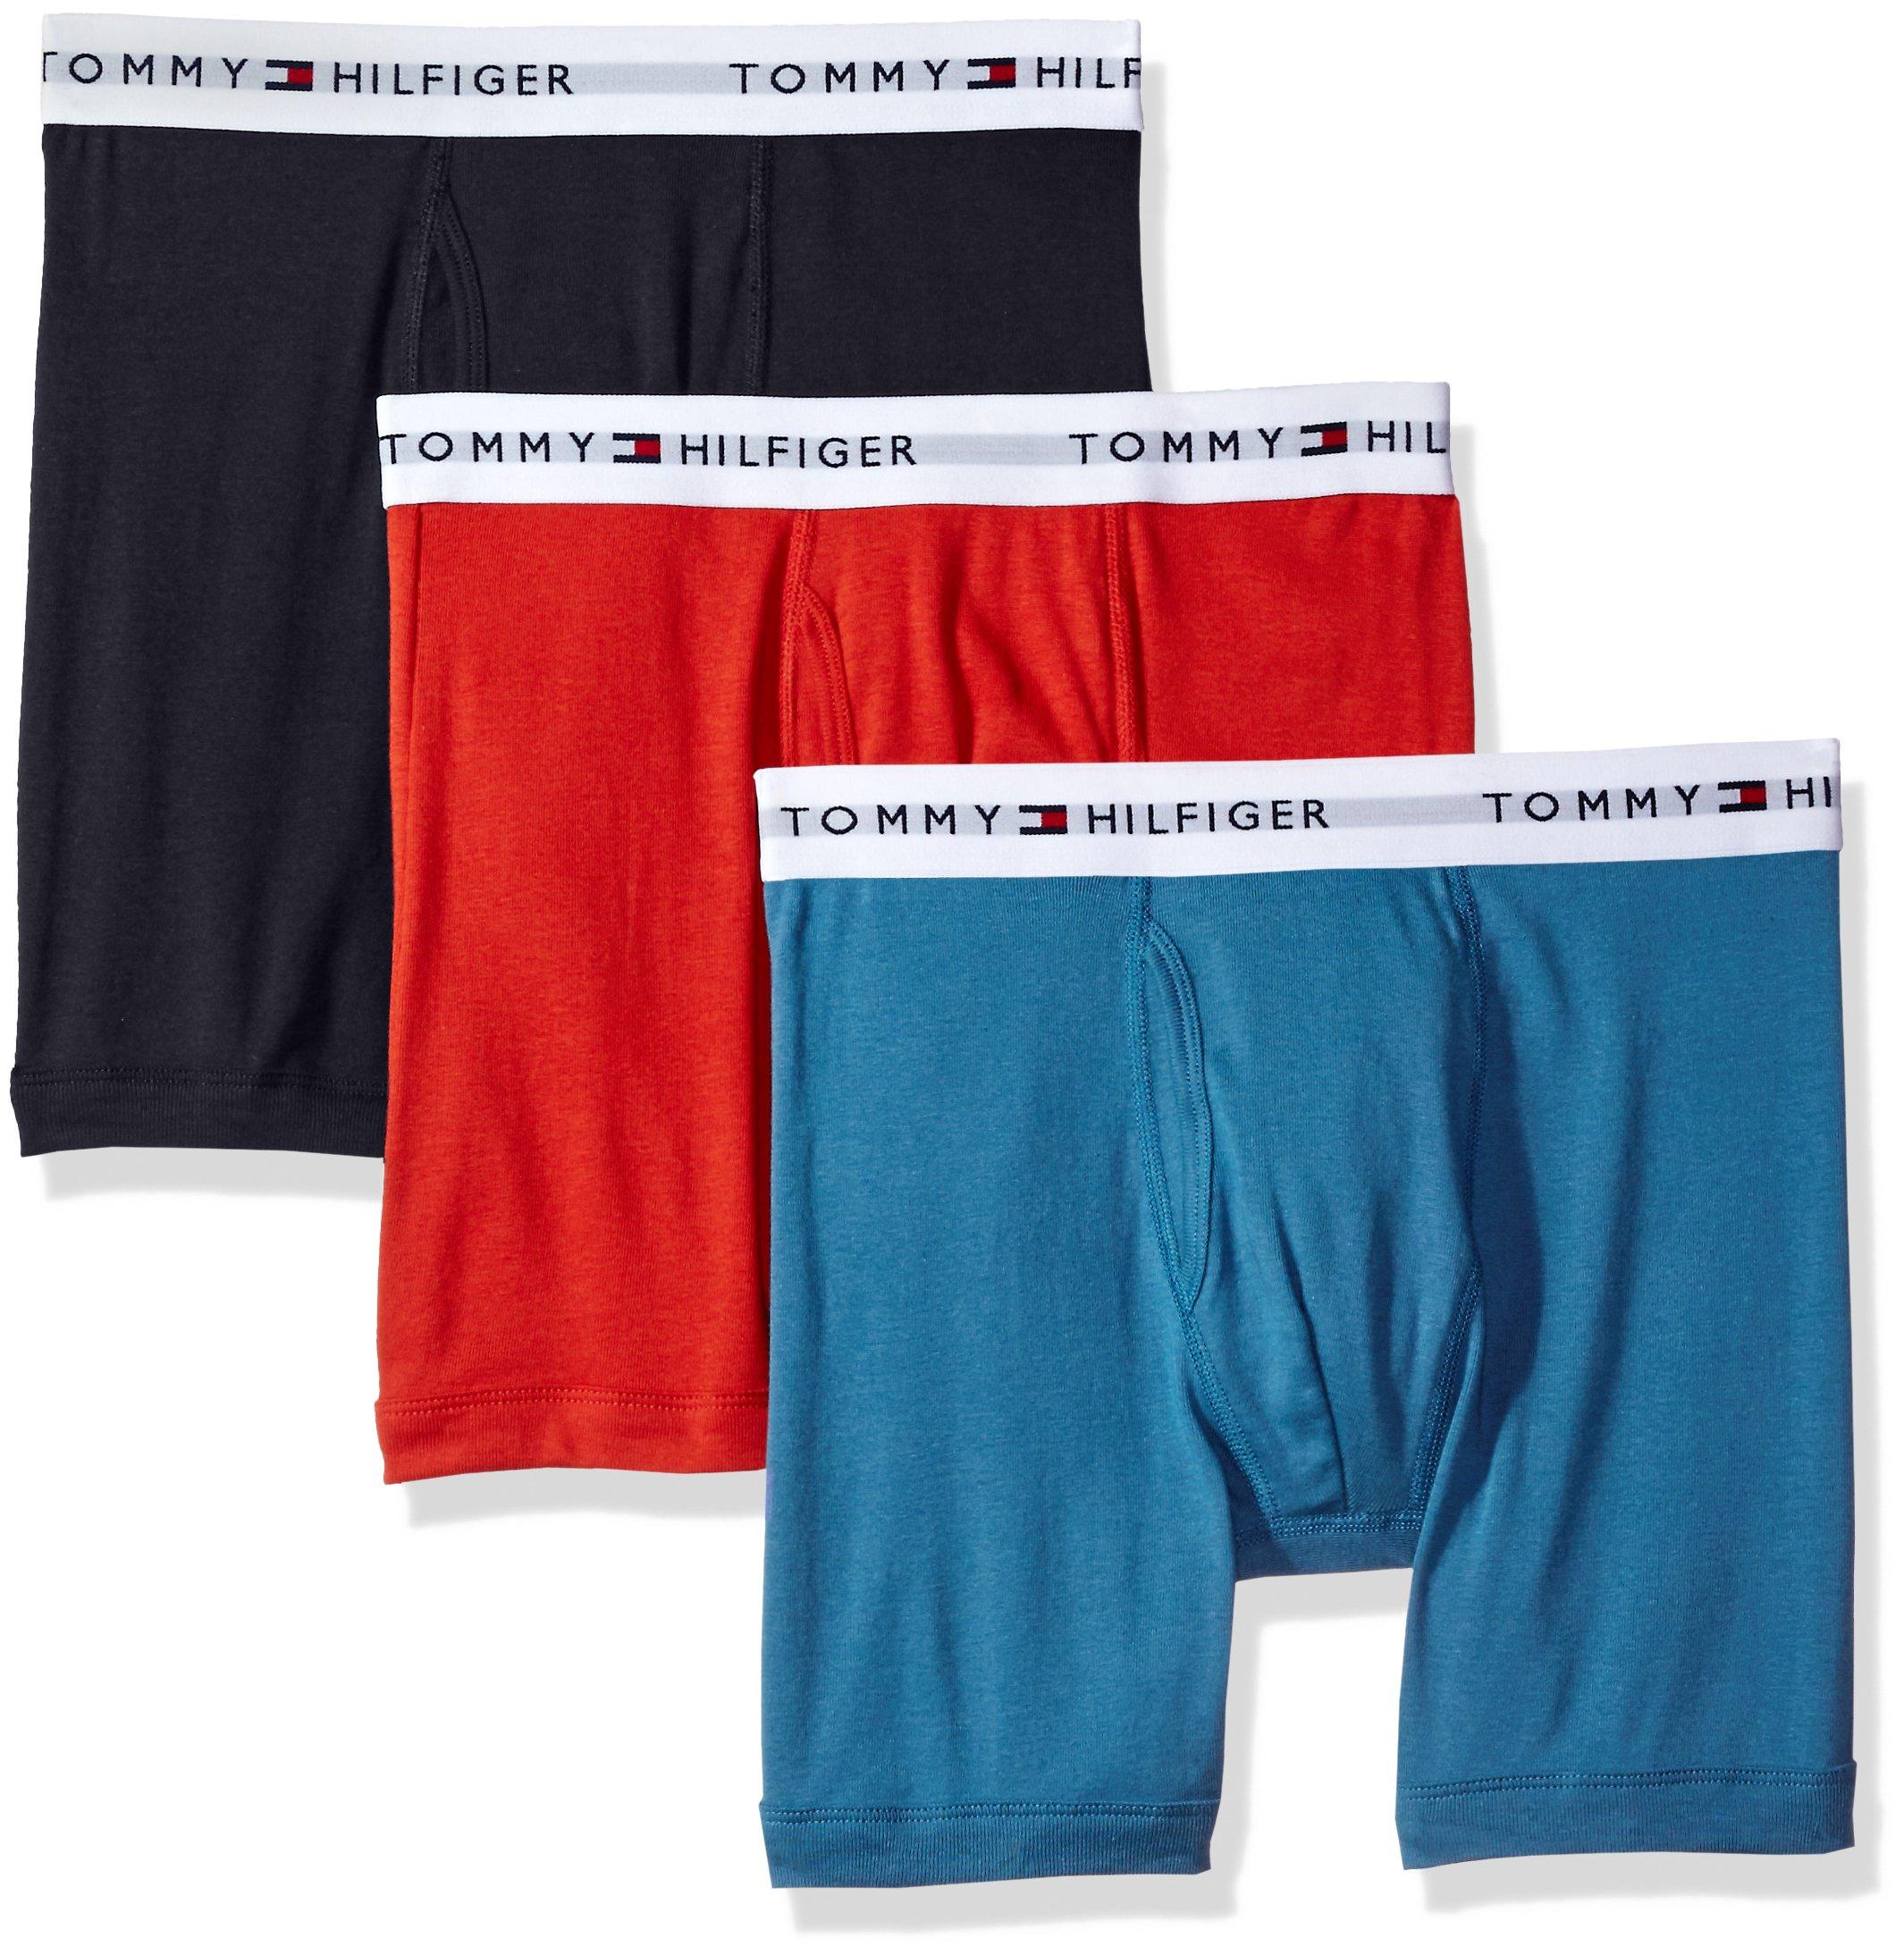 Tommy Hilfiger Men's Underwear 3 Pack Cotton Classics Trunks, Turnip, Medium